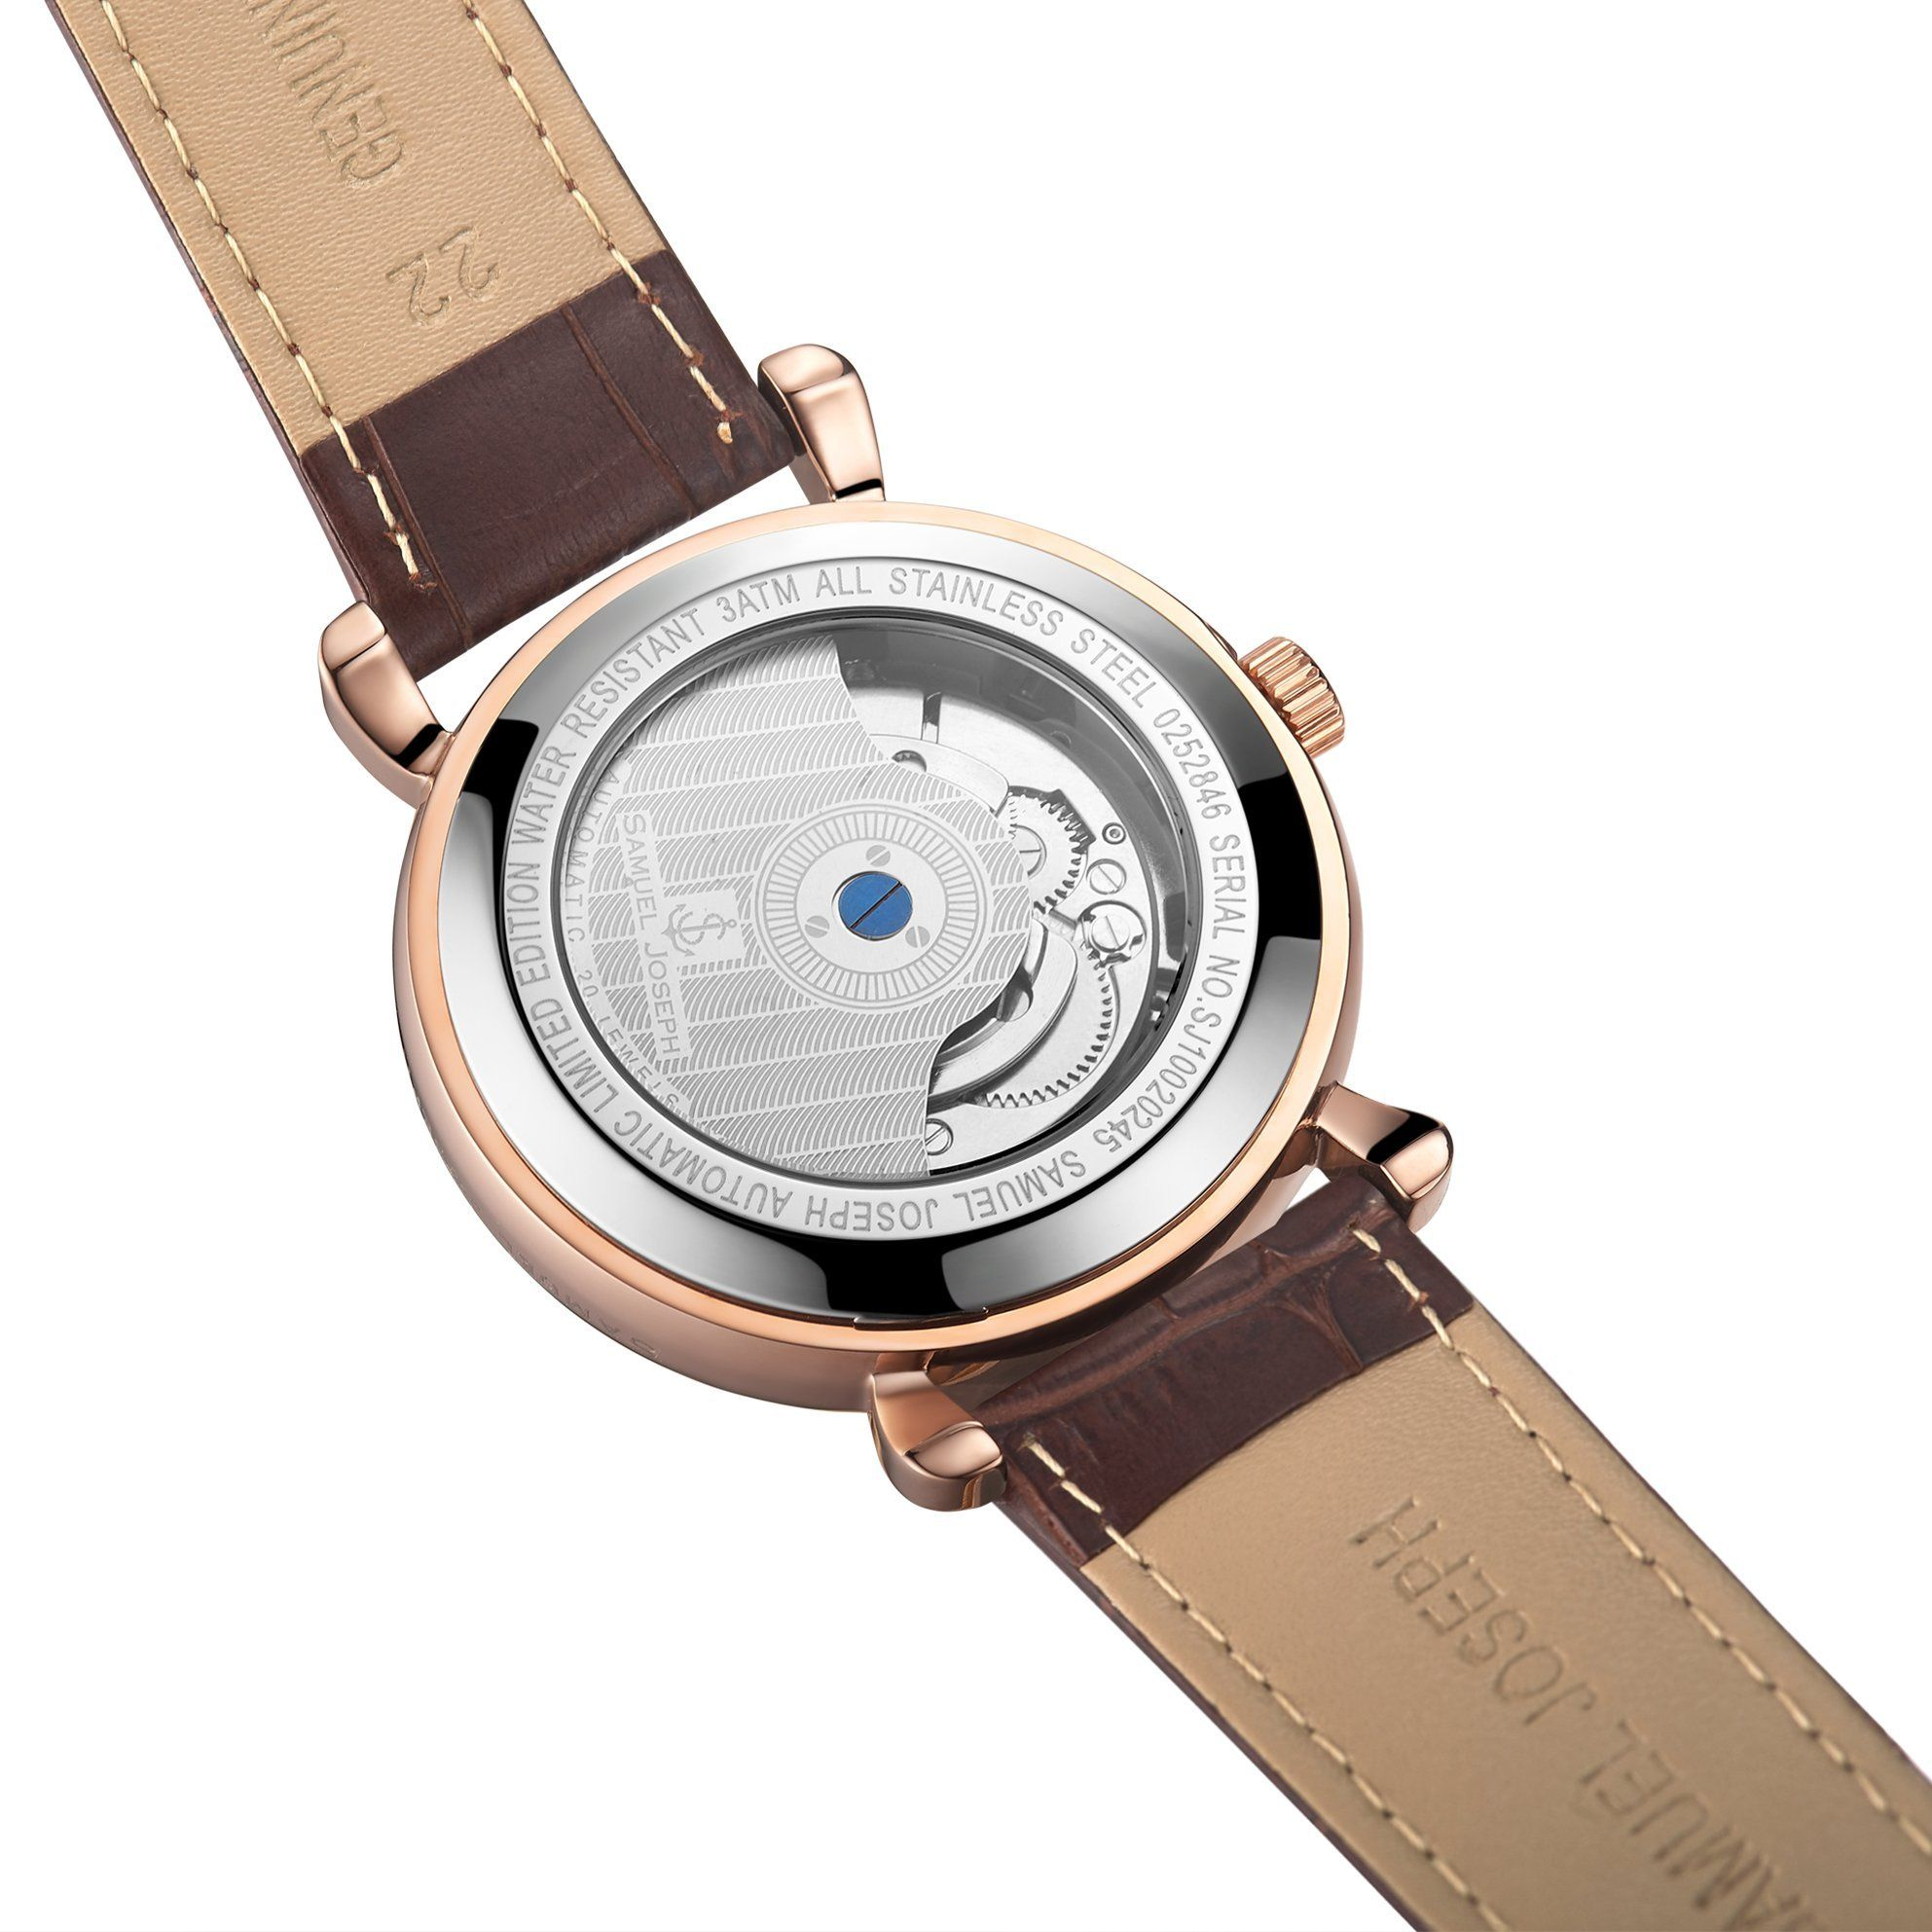 Samuel Joseph Limited Edition Rose & Brown Automatic Designer Mens Watch